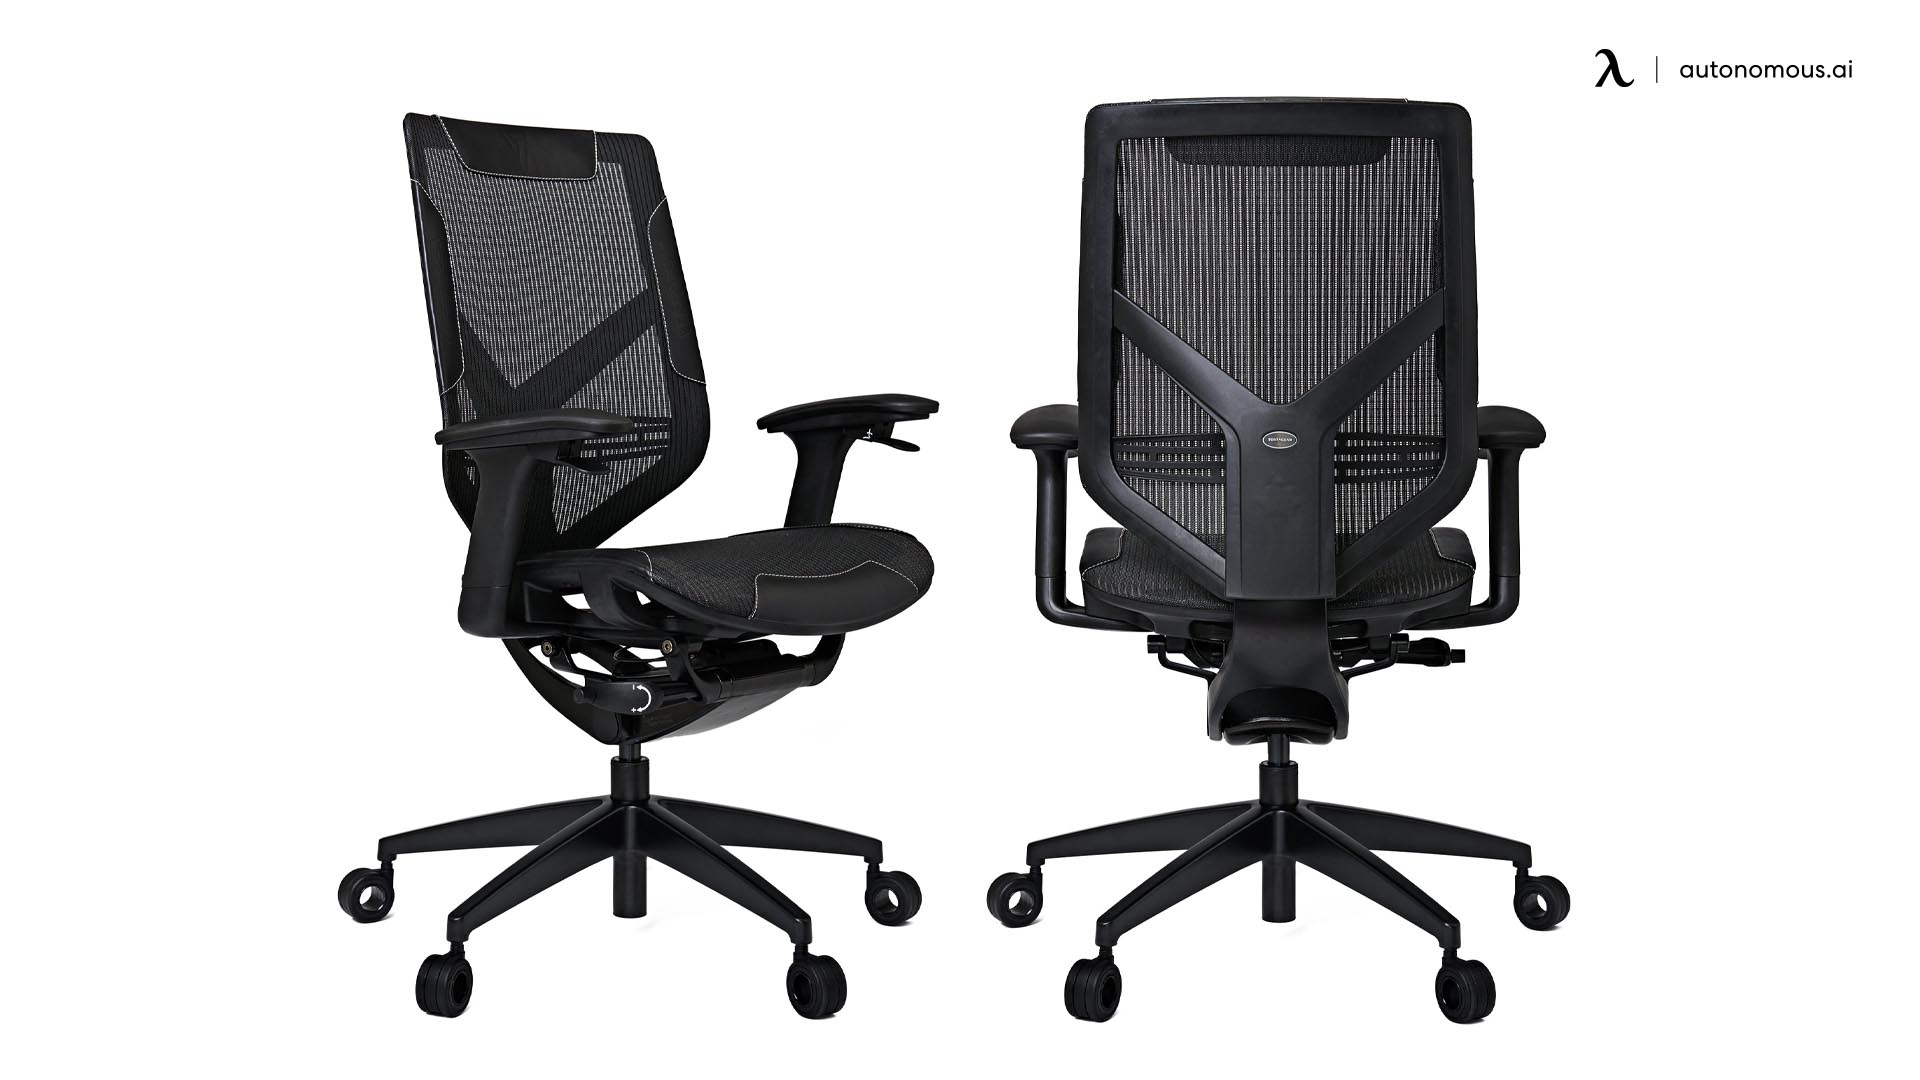 Vertagear Triigger 275 High Back Office Chair